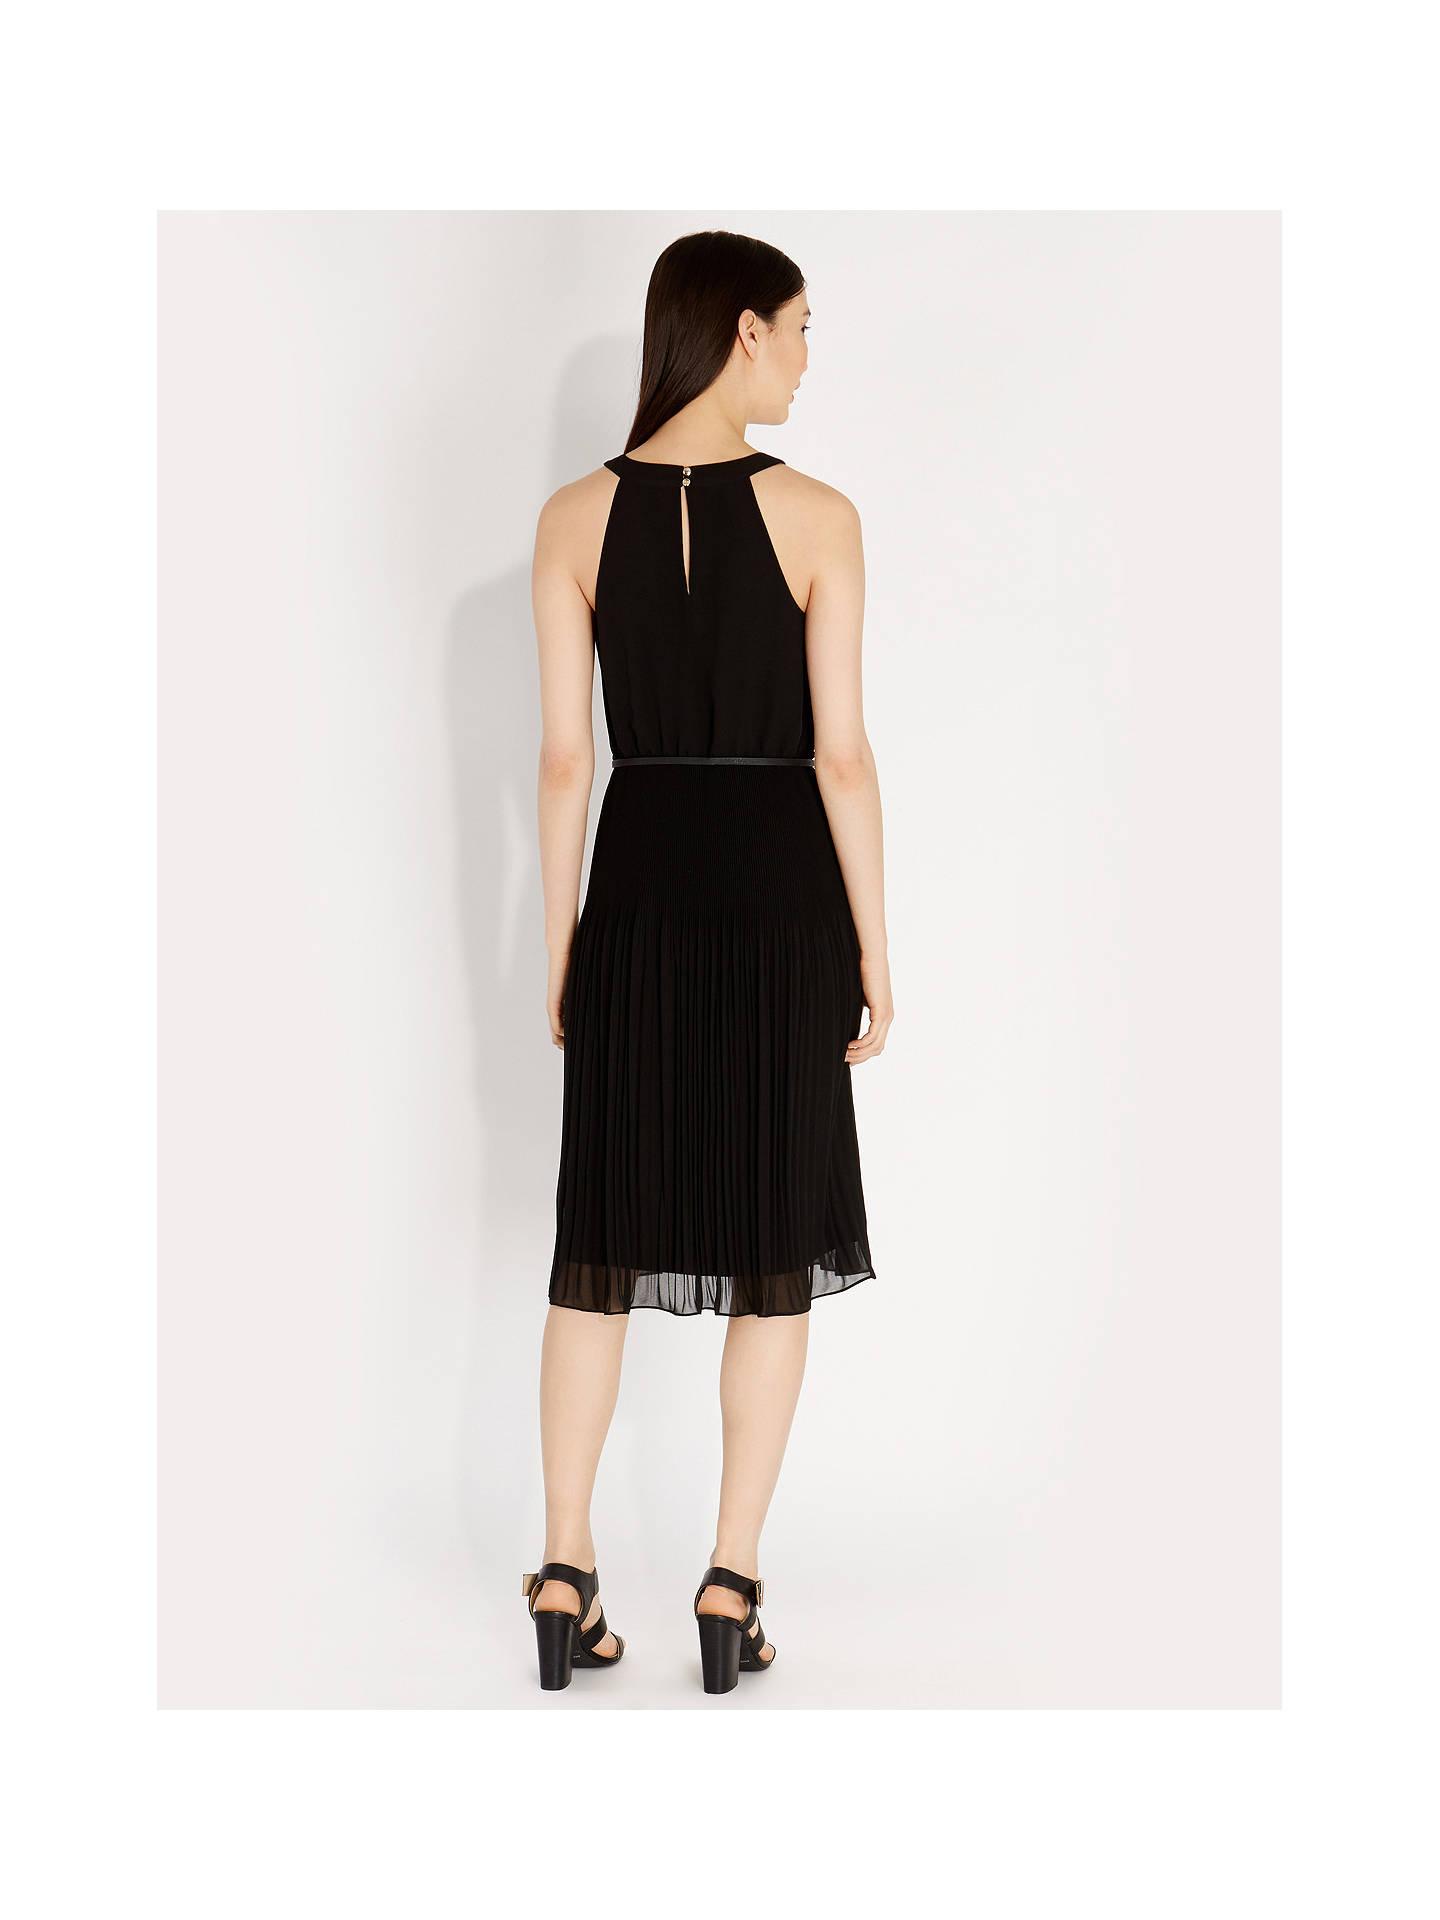 873a82631772 ... Buy Oasis Chiffon Pleated Midi Dress, Black, 8 Online at johnlewis.com  ...